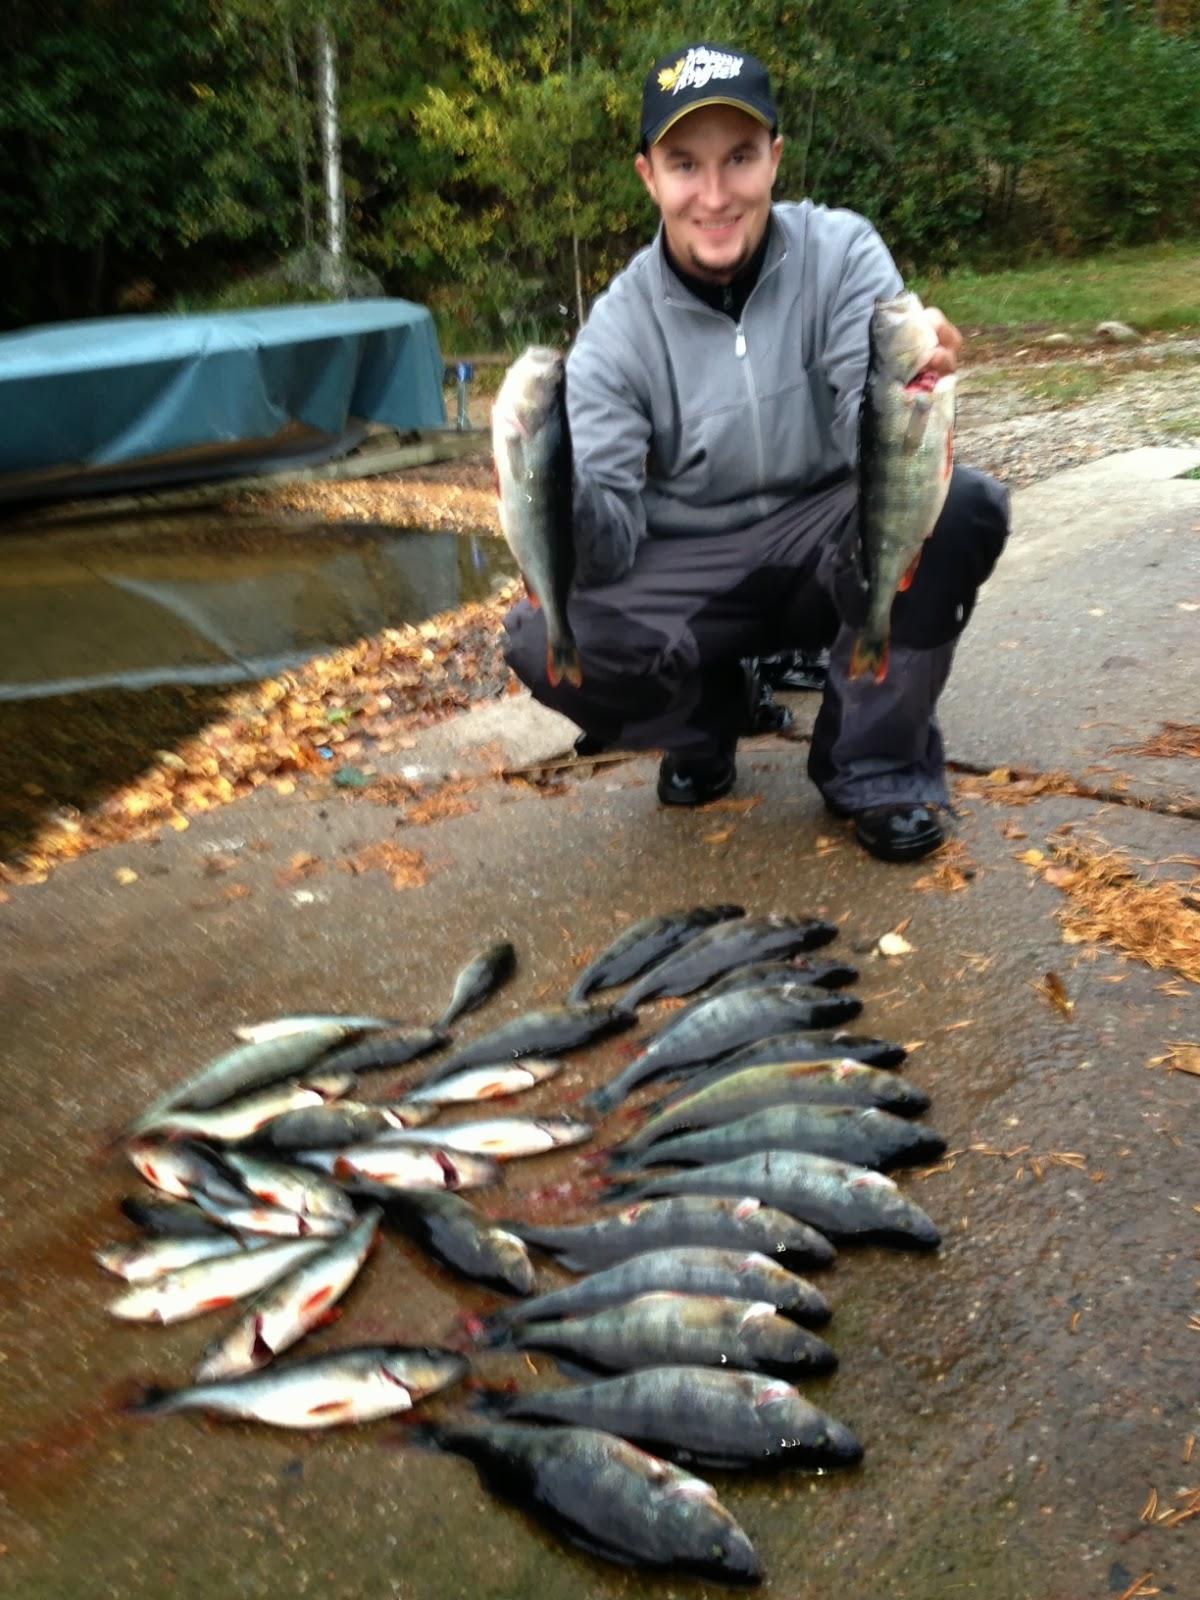 Lake Saimaa fishing travels: Fishing in Finland at lake Saimaa. September 2013